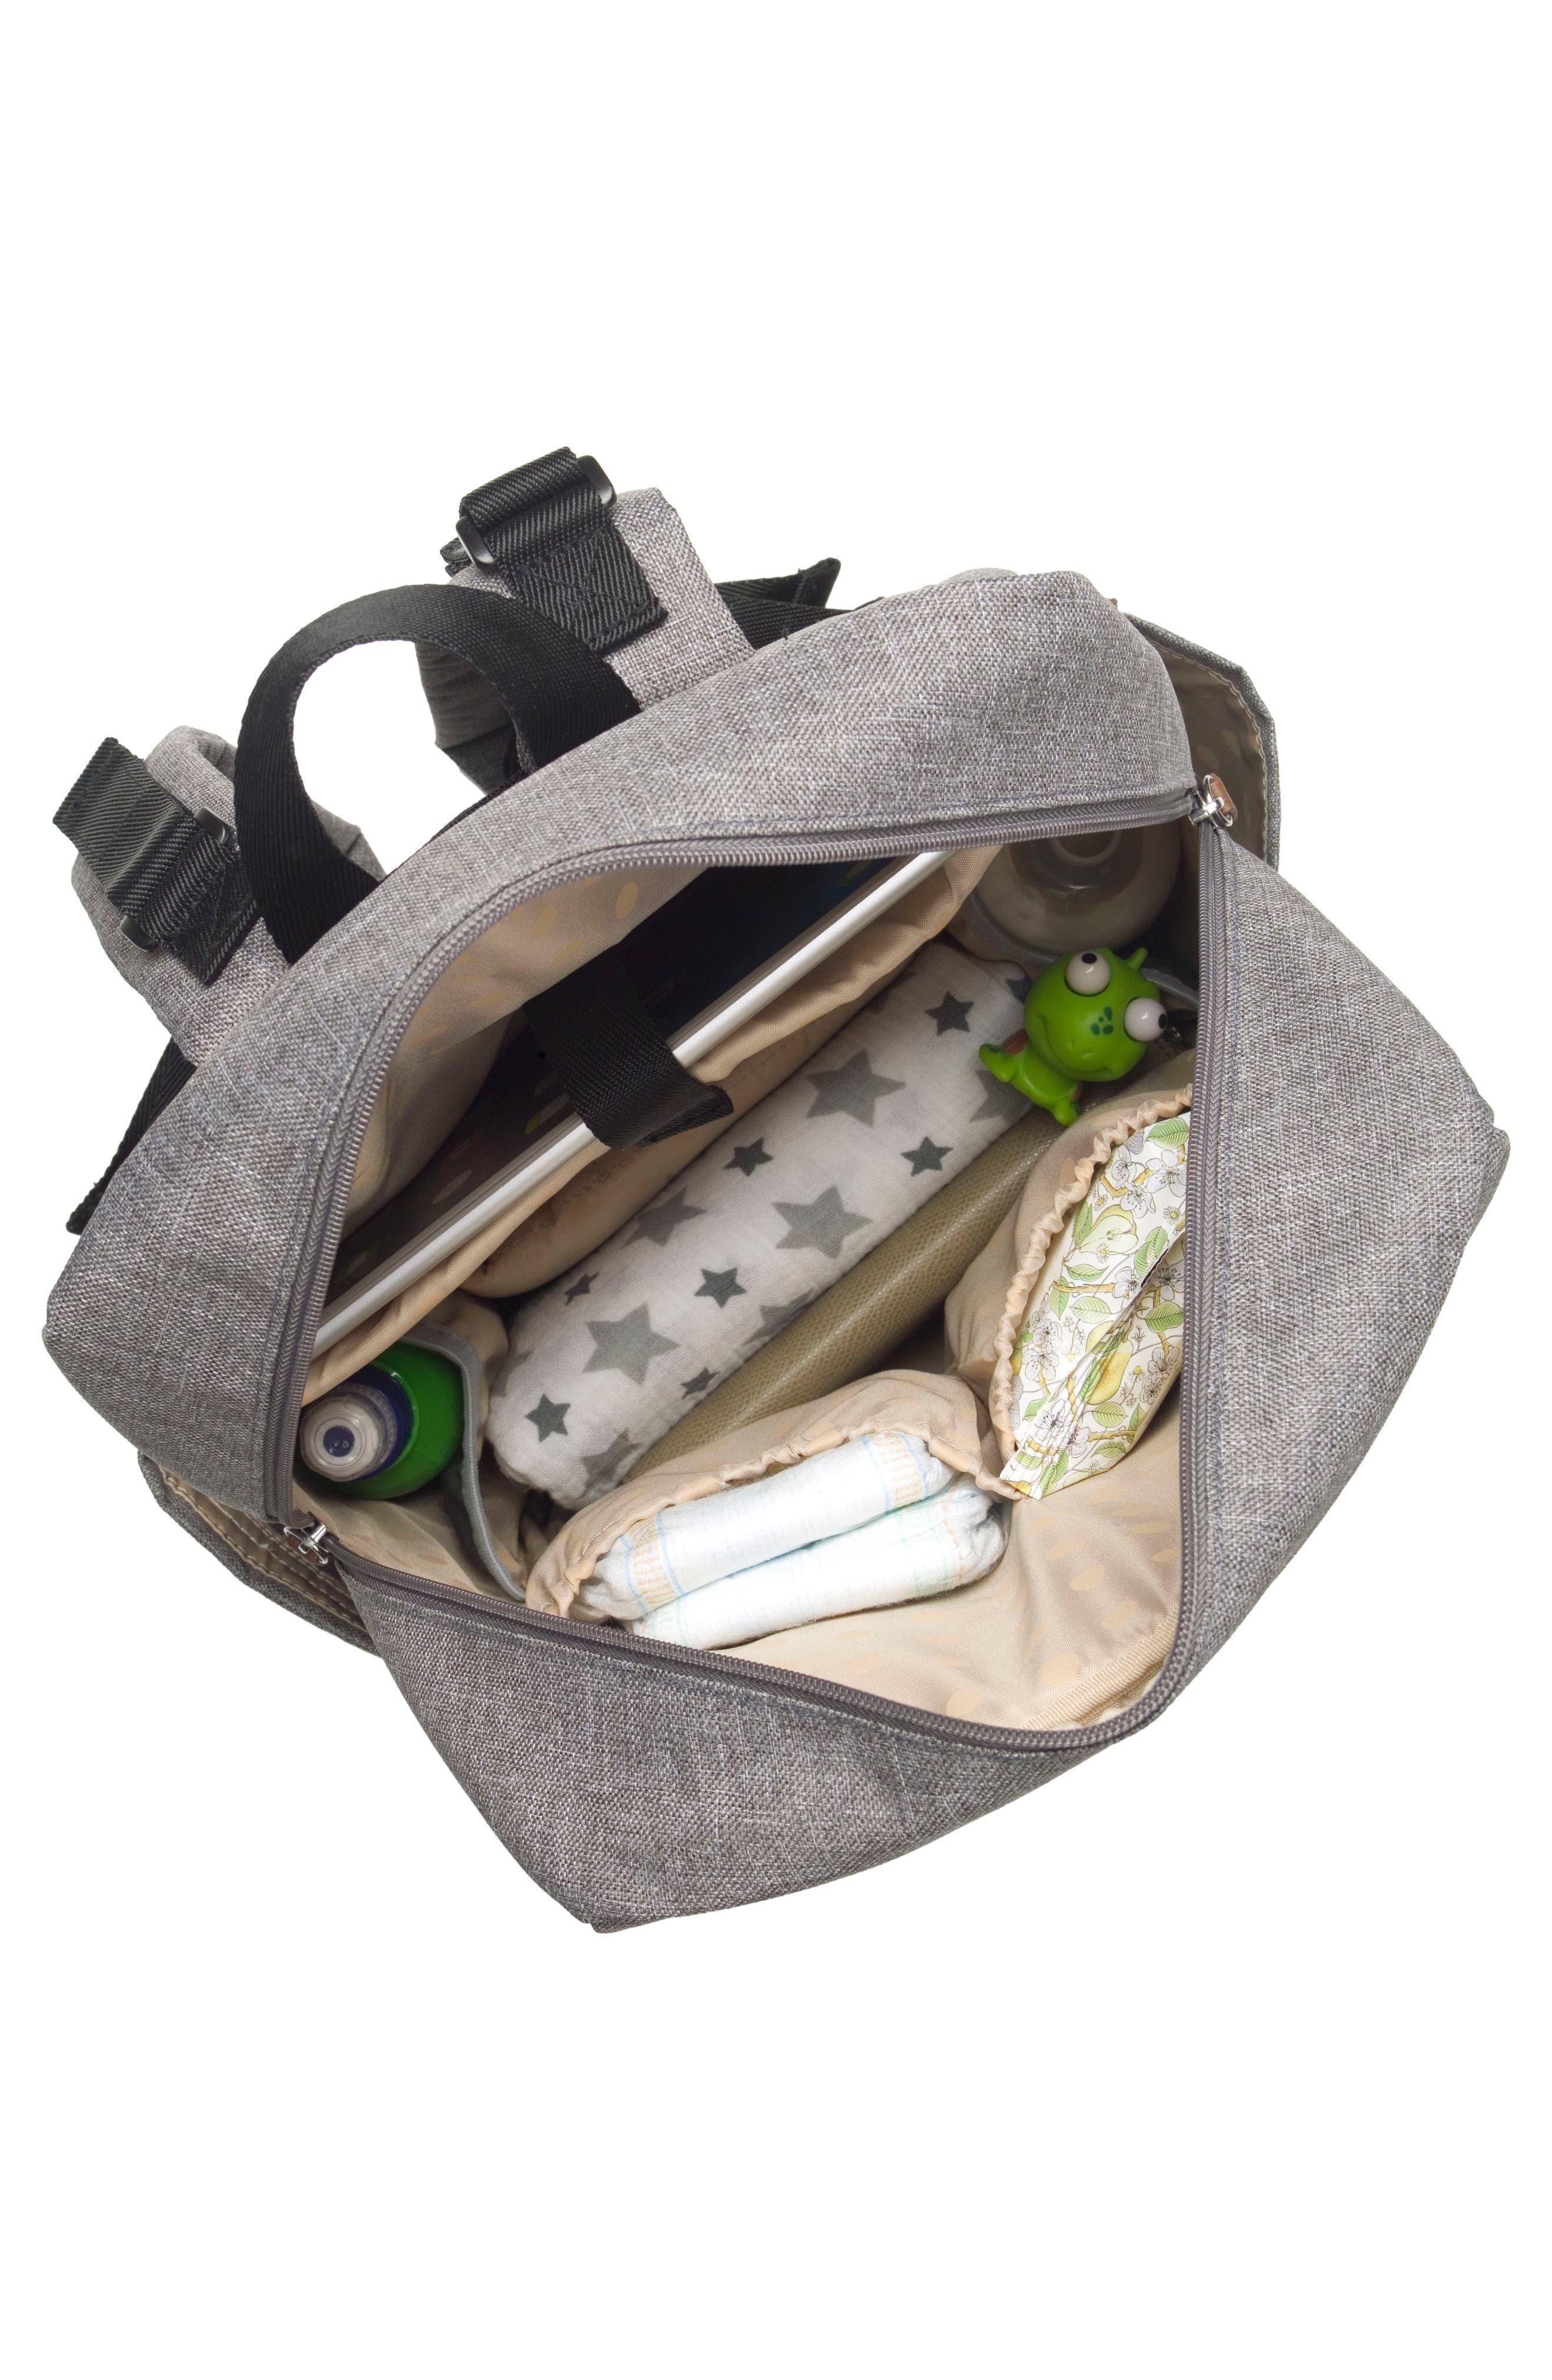 George Water Resistant Diaper Backpack,                             Alternate thumbnail 10, color,                             BLACK/ GREY